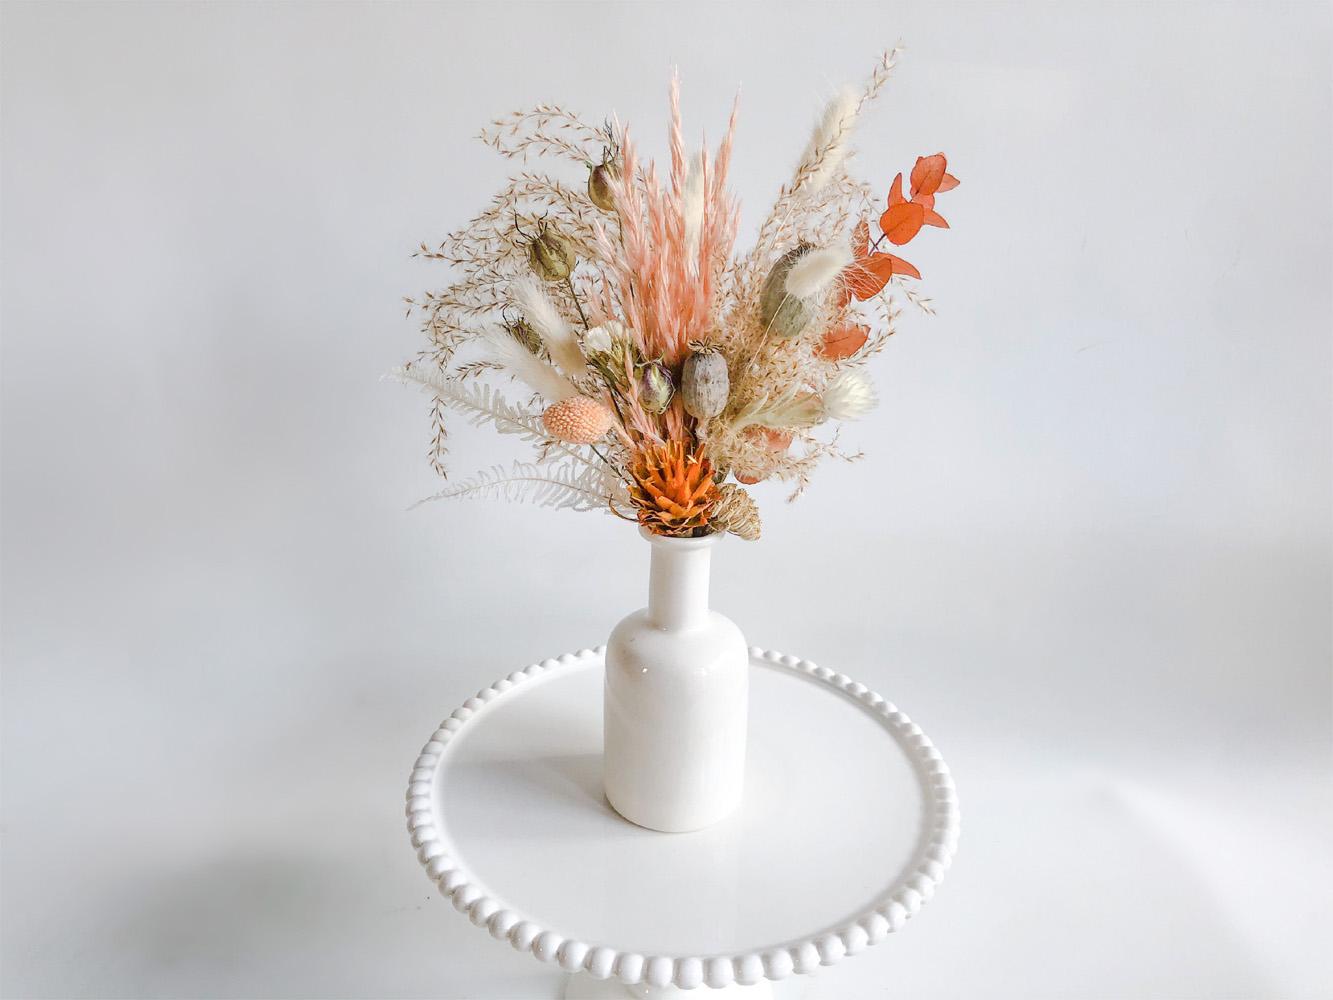 Peach Blossom Collection Alternative Image